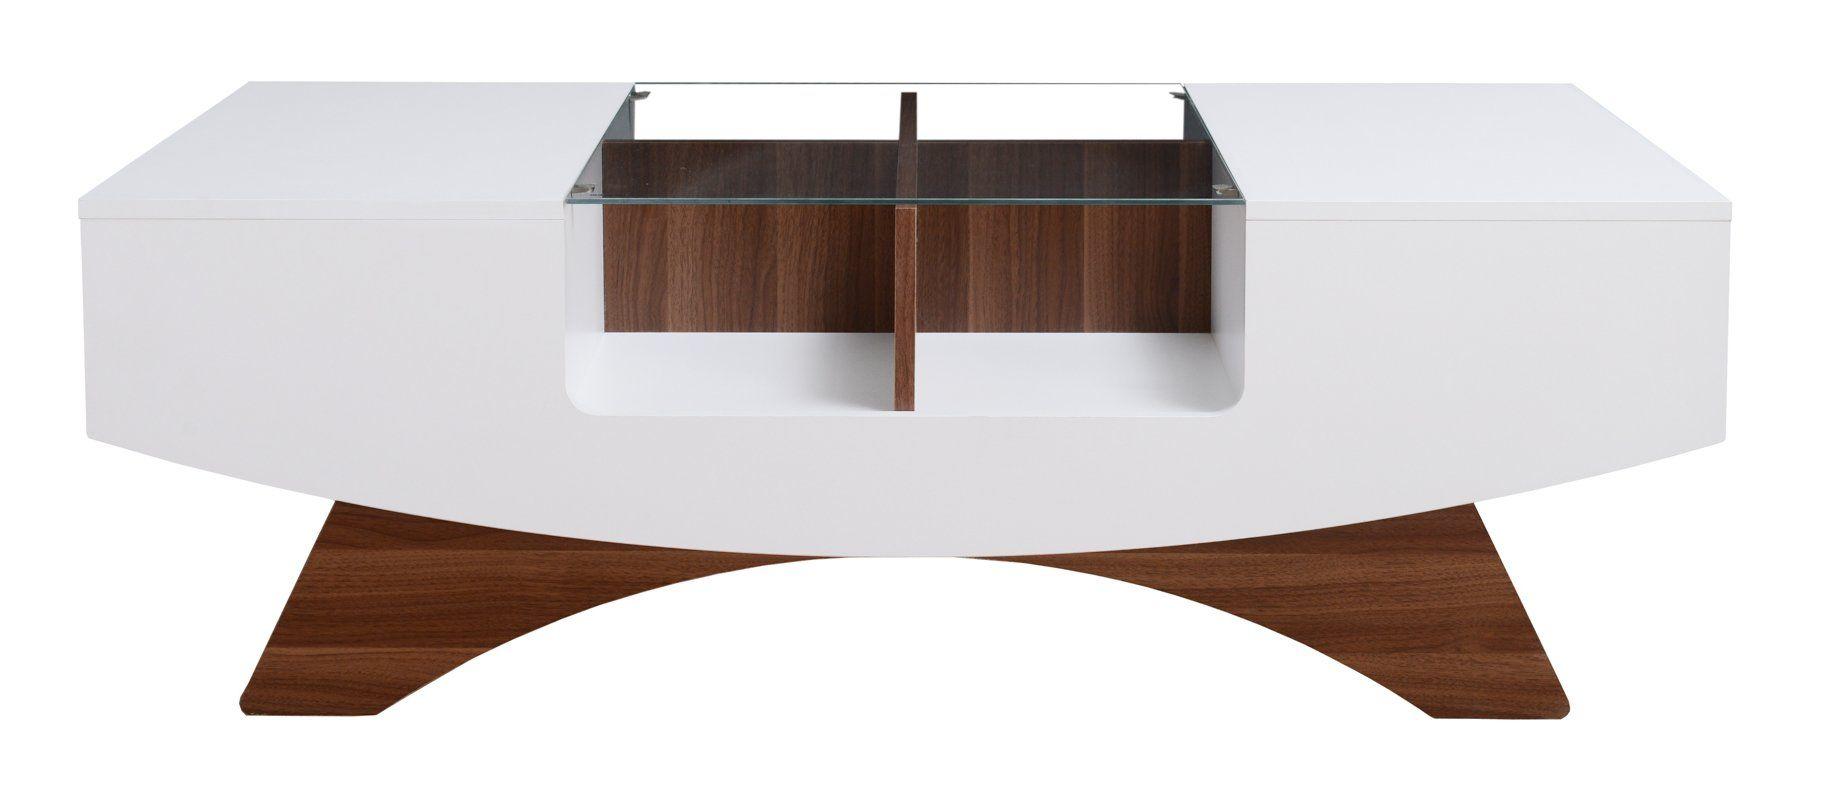 Wade Logan Madilynn Coffee Table Reviews Wayfair Coffee Table Furniture Coffee Table Contemporary Coffee Table [ 786 x 1826 Pixel ]